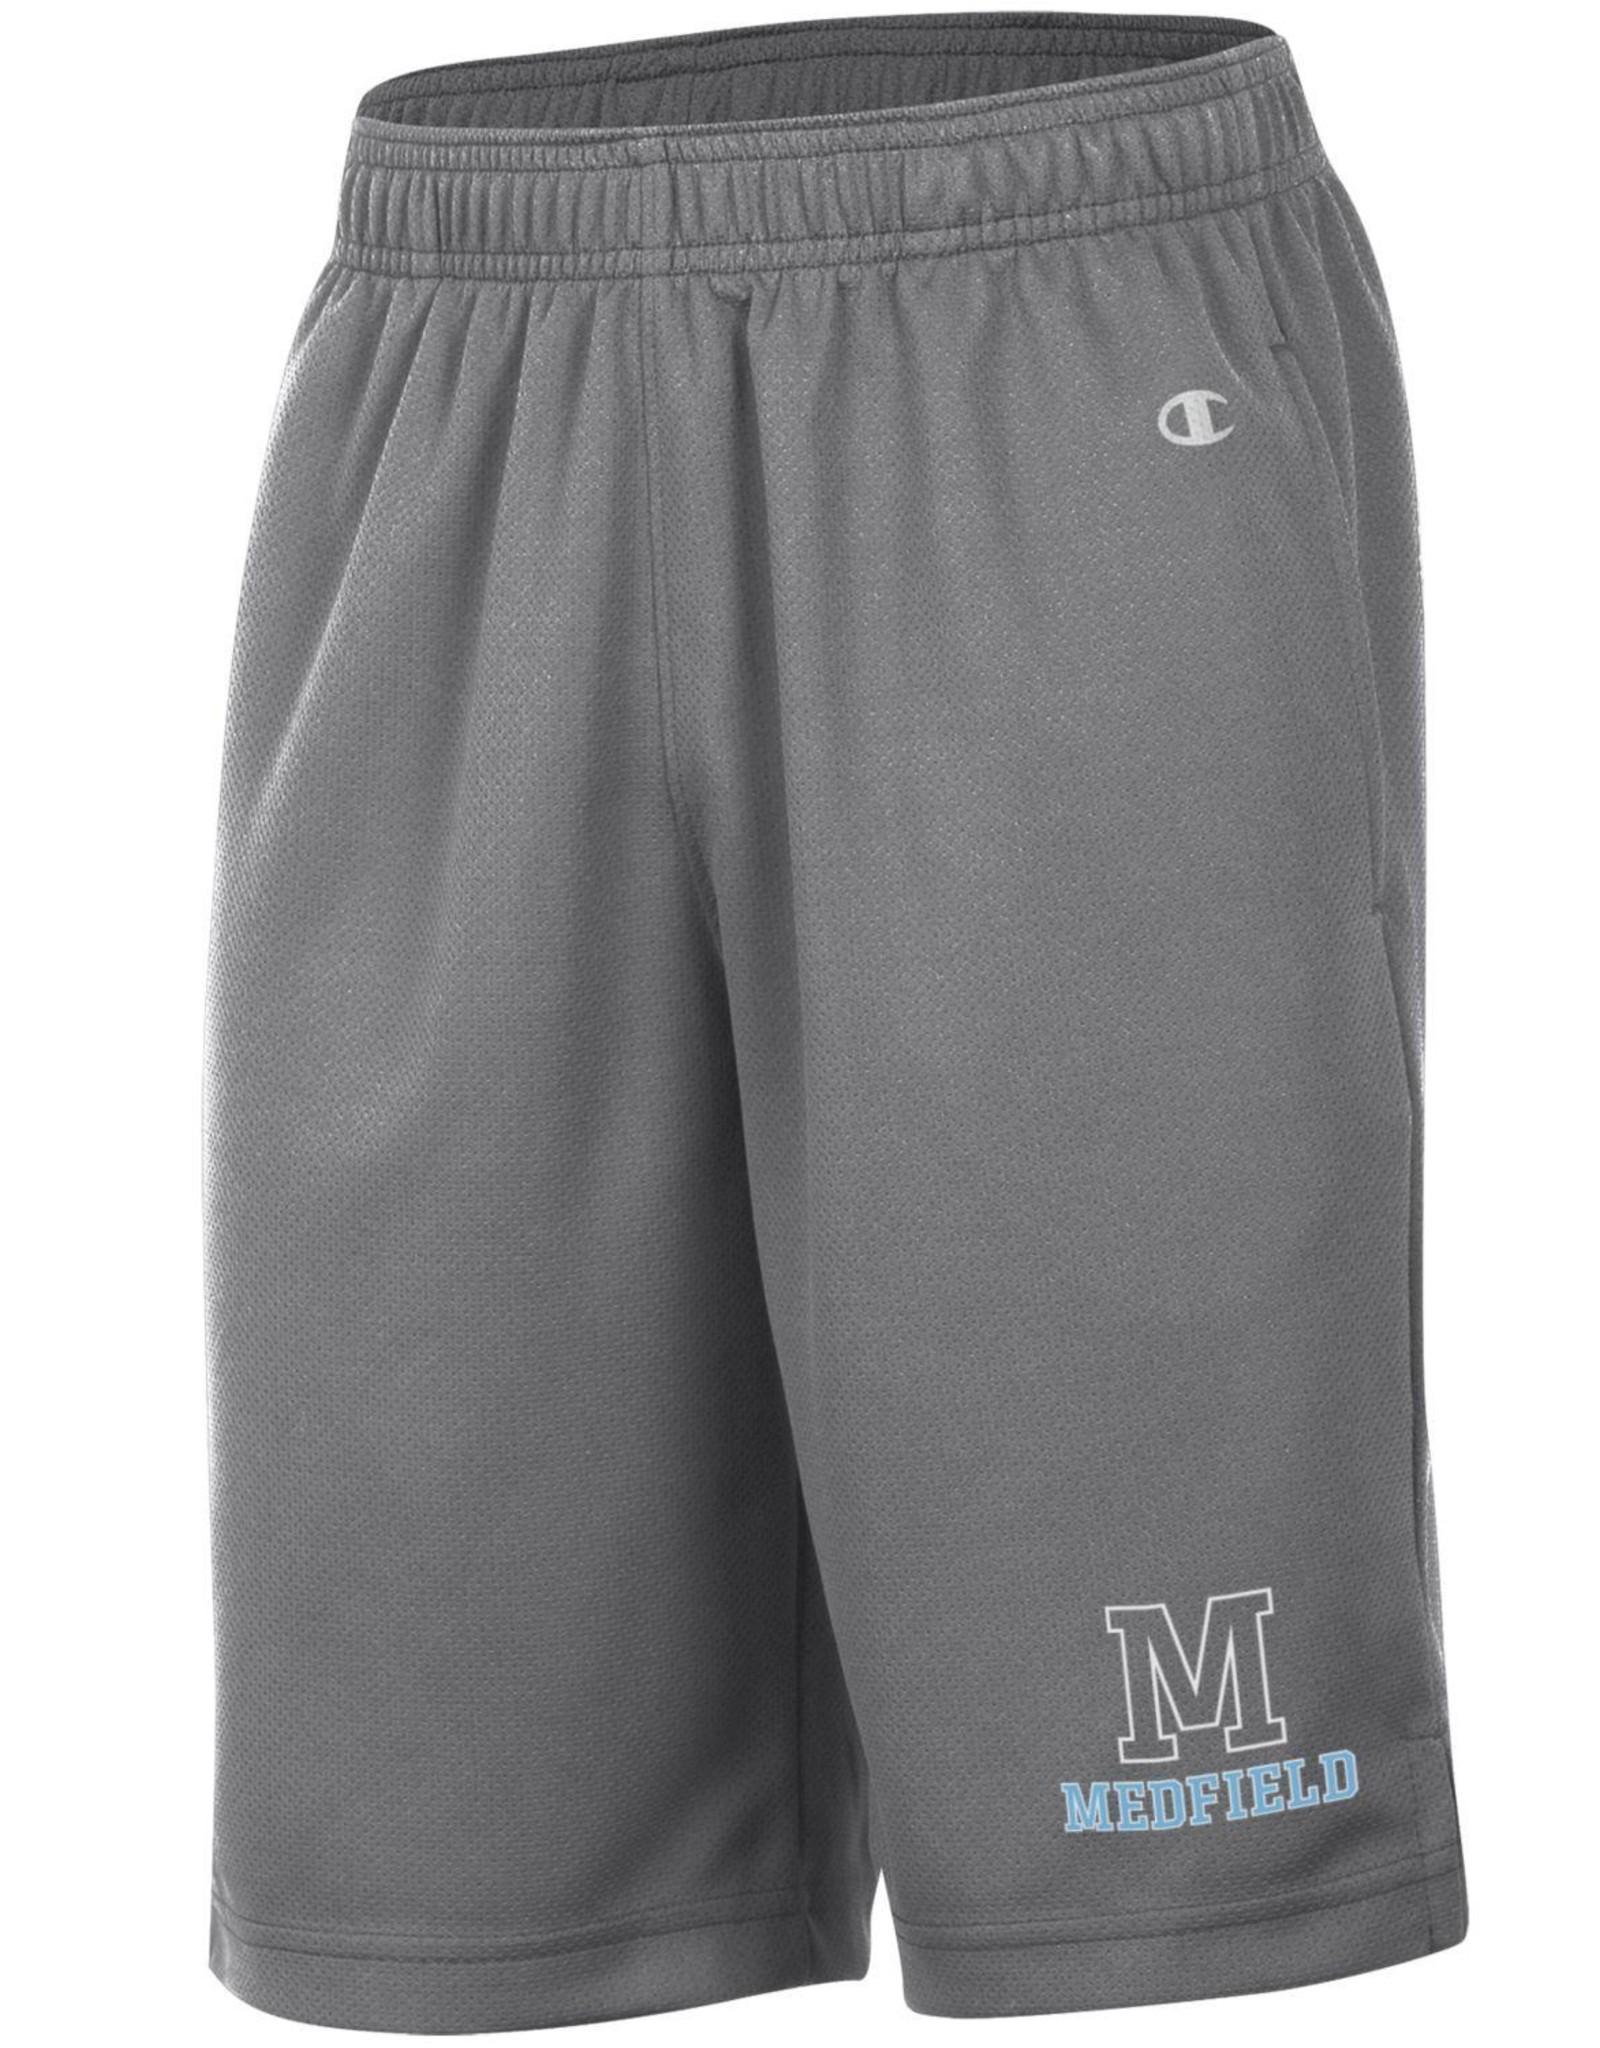 Champion - Youth Mesh Shorts